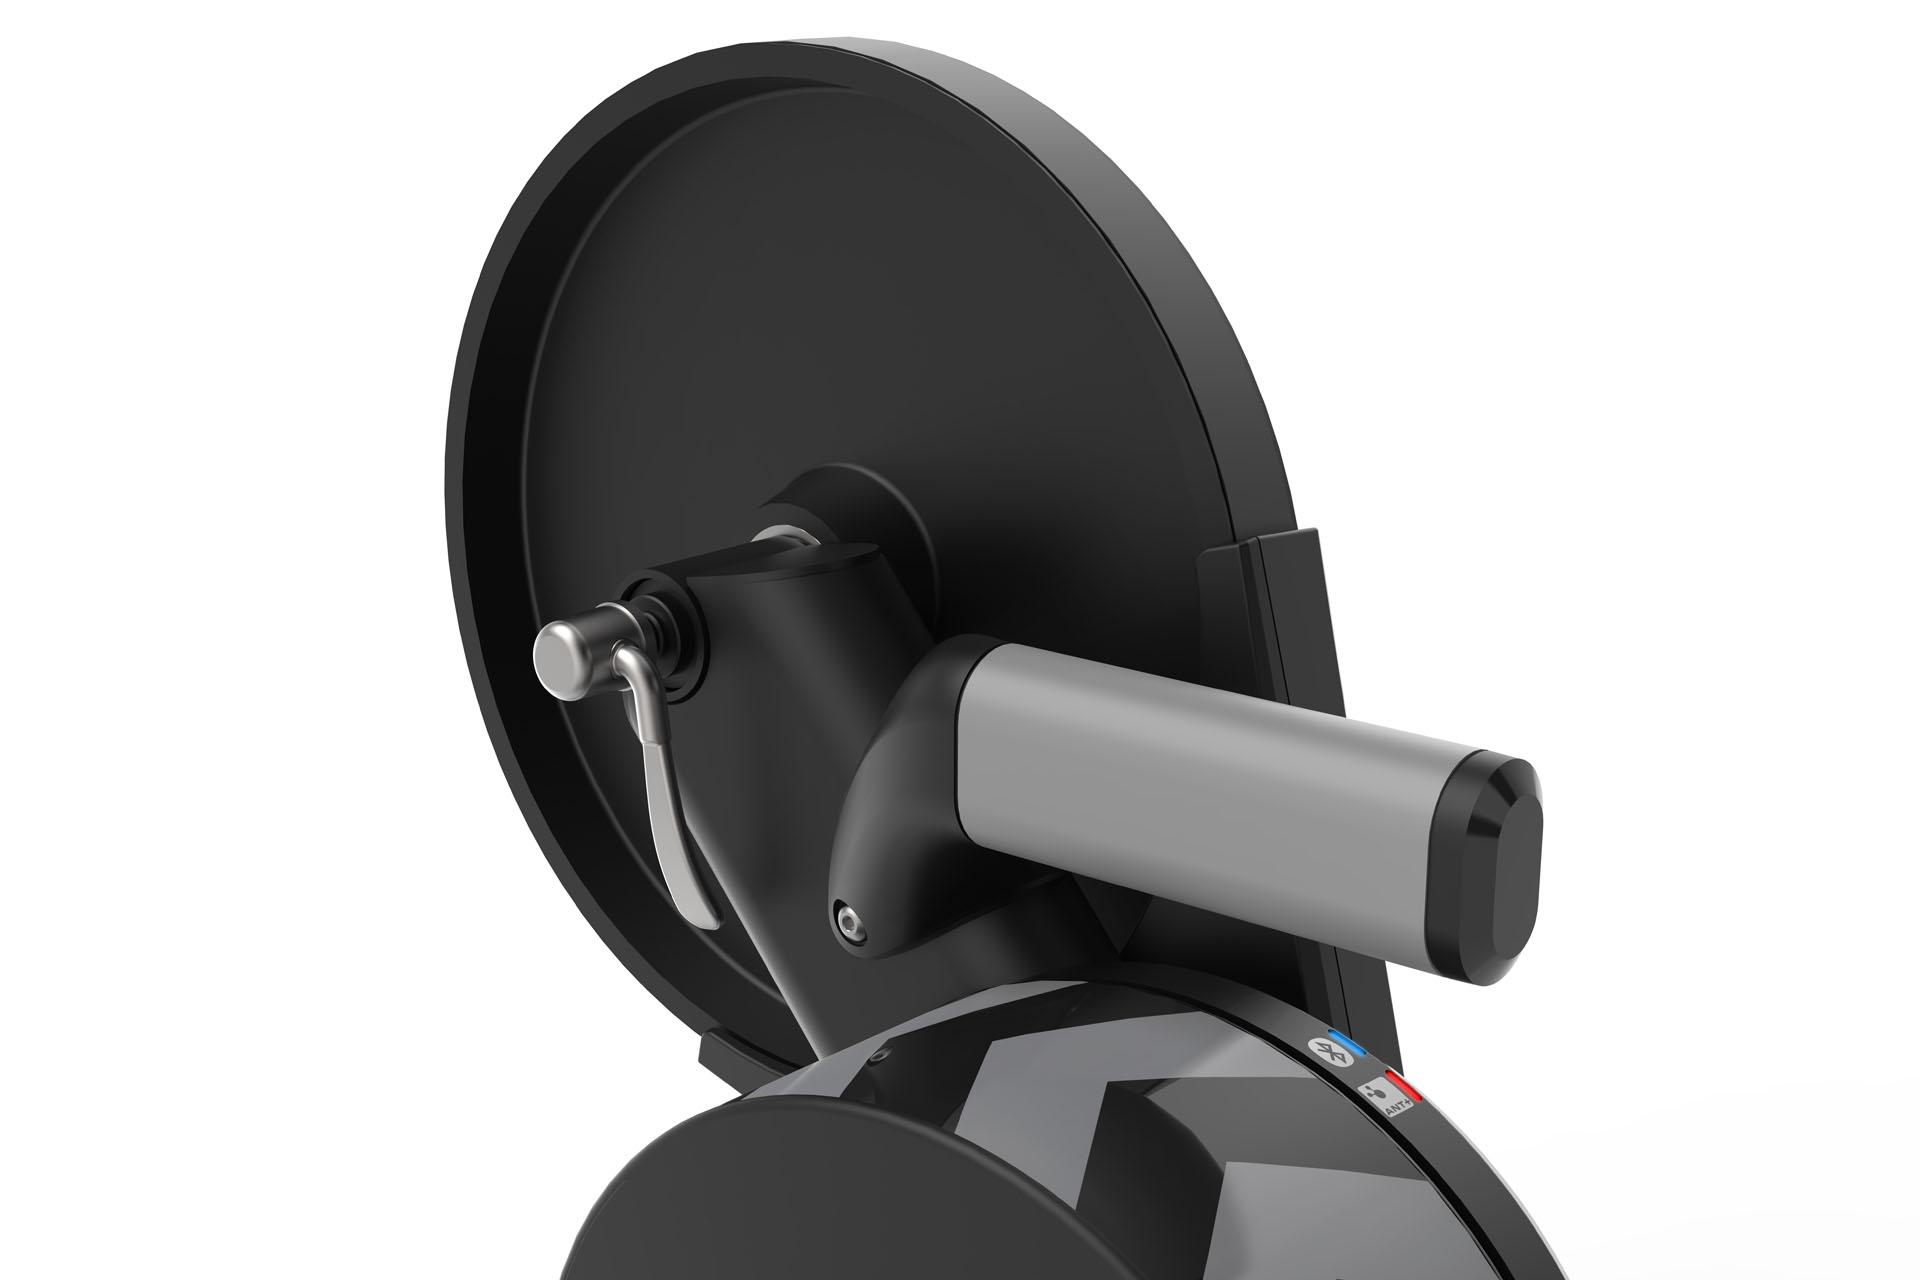 Wahoo-KICKR 2020-Product-05